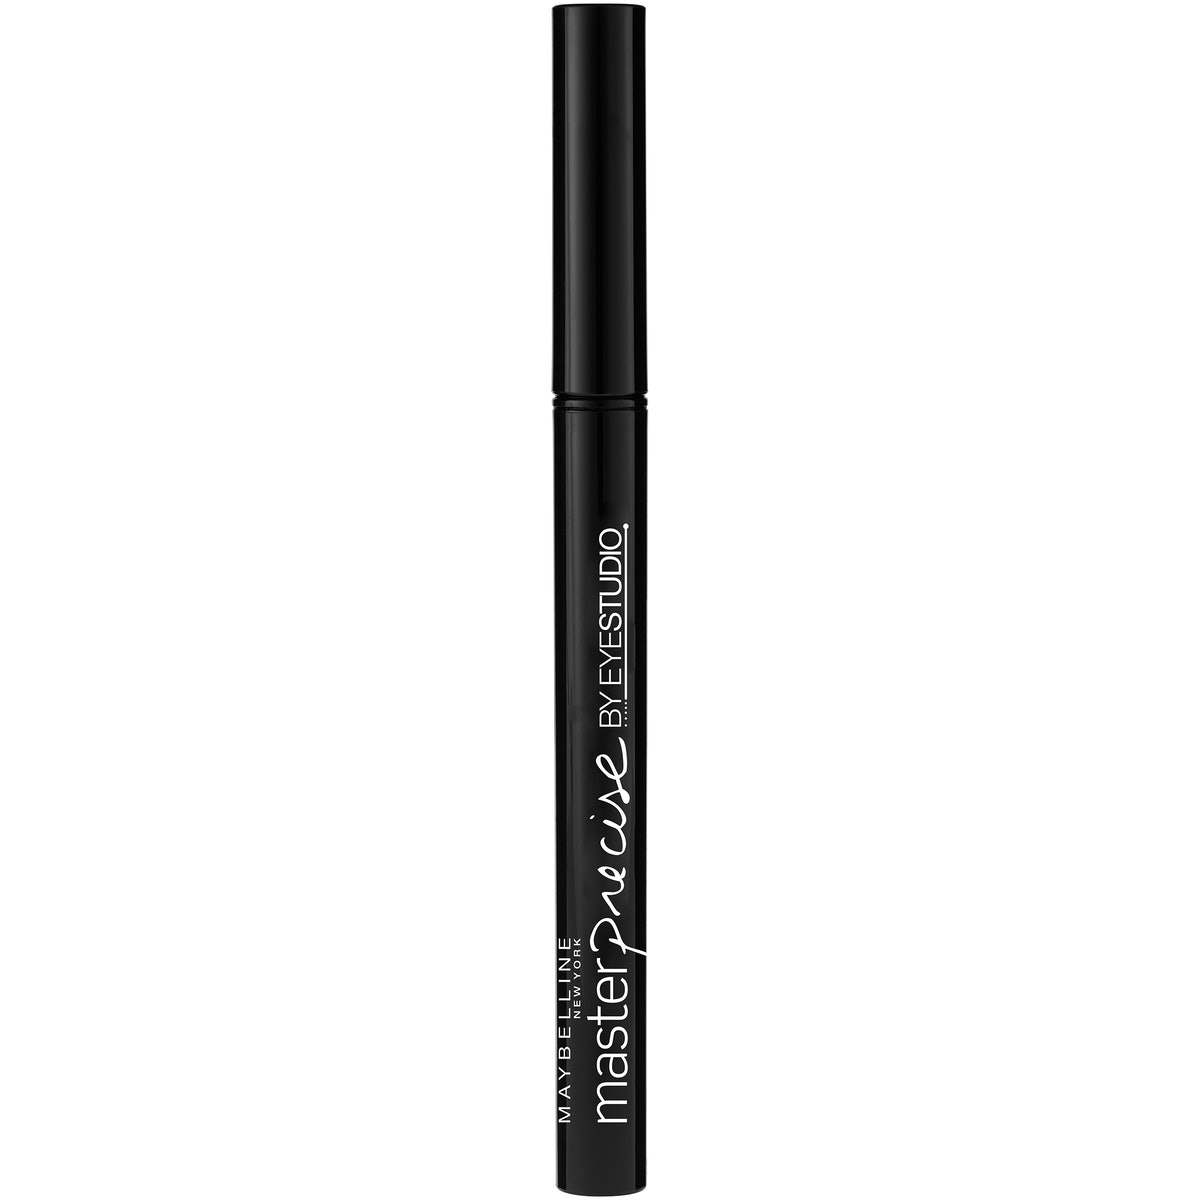 Maybelline New York Eye Studio Master Precise Liquid Eyeliner, No.110 Black, 0.037 Fluid Ounce